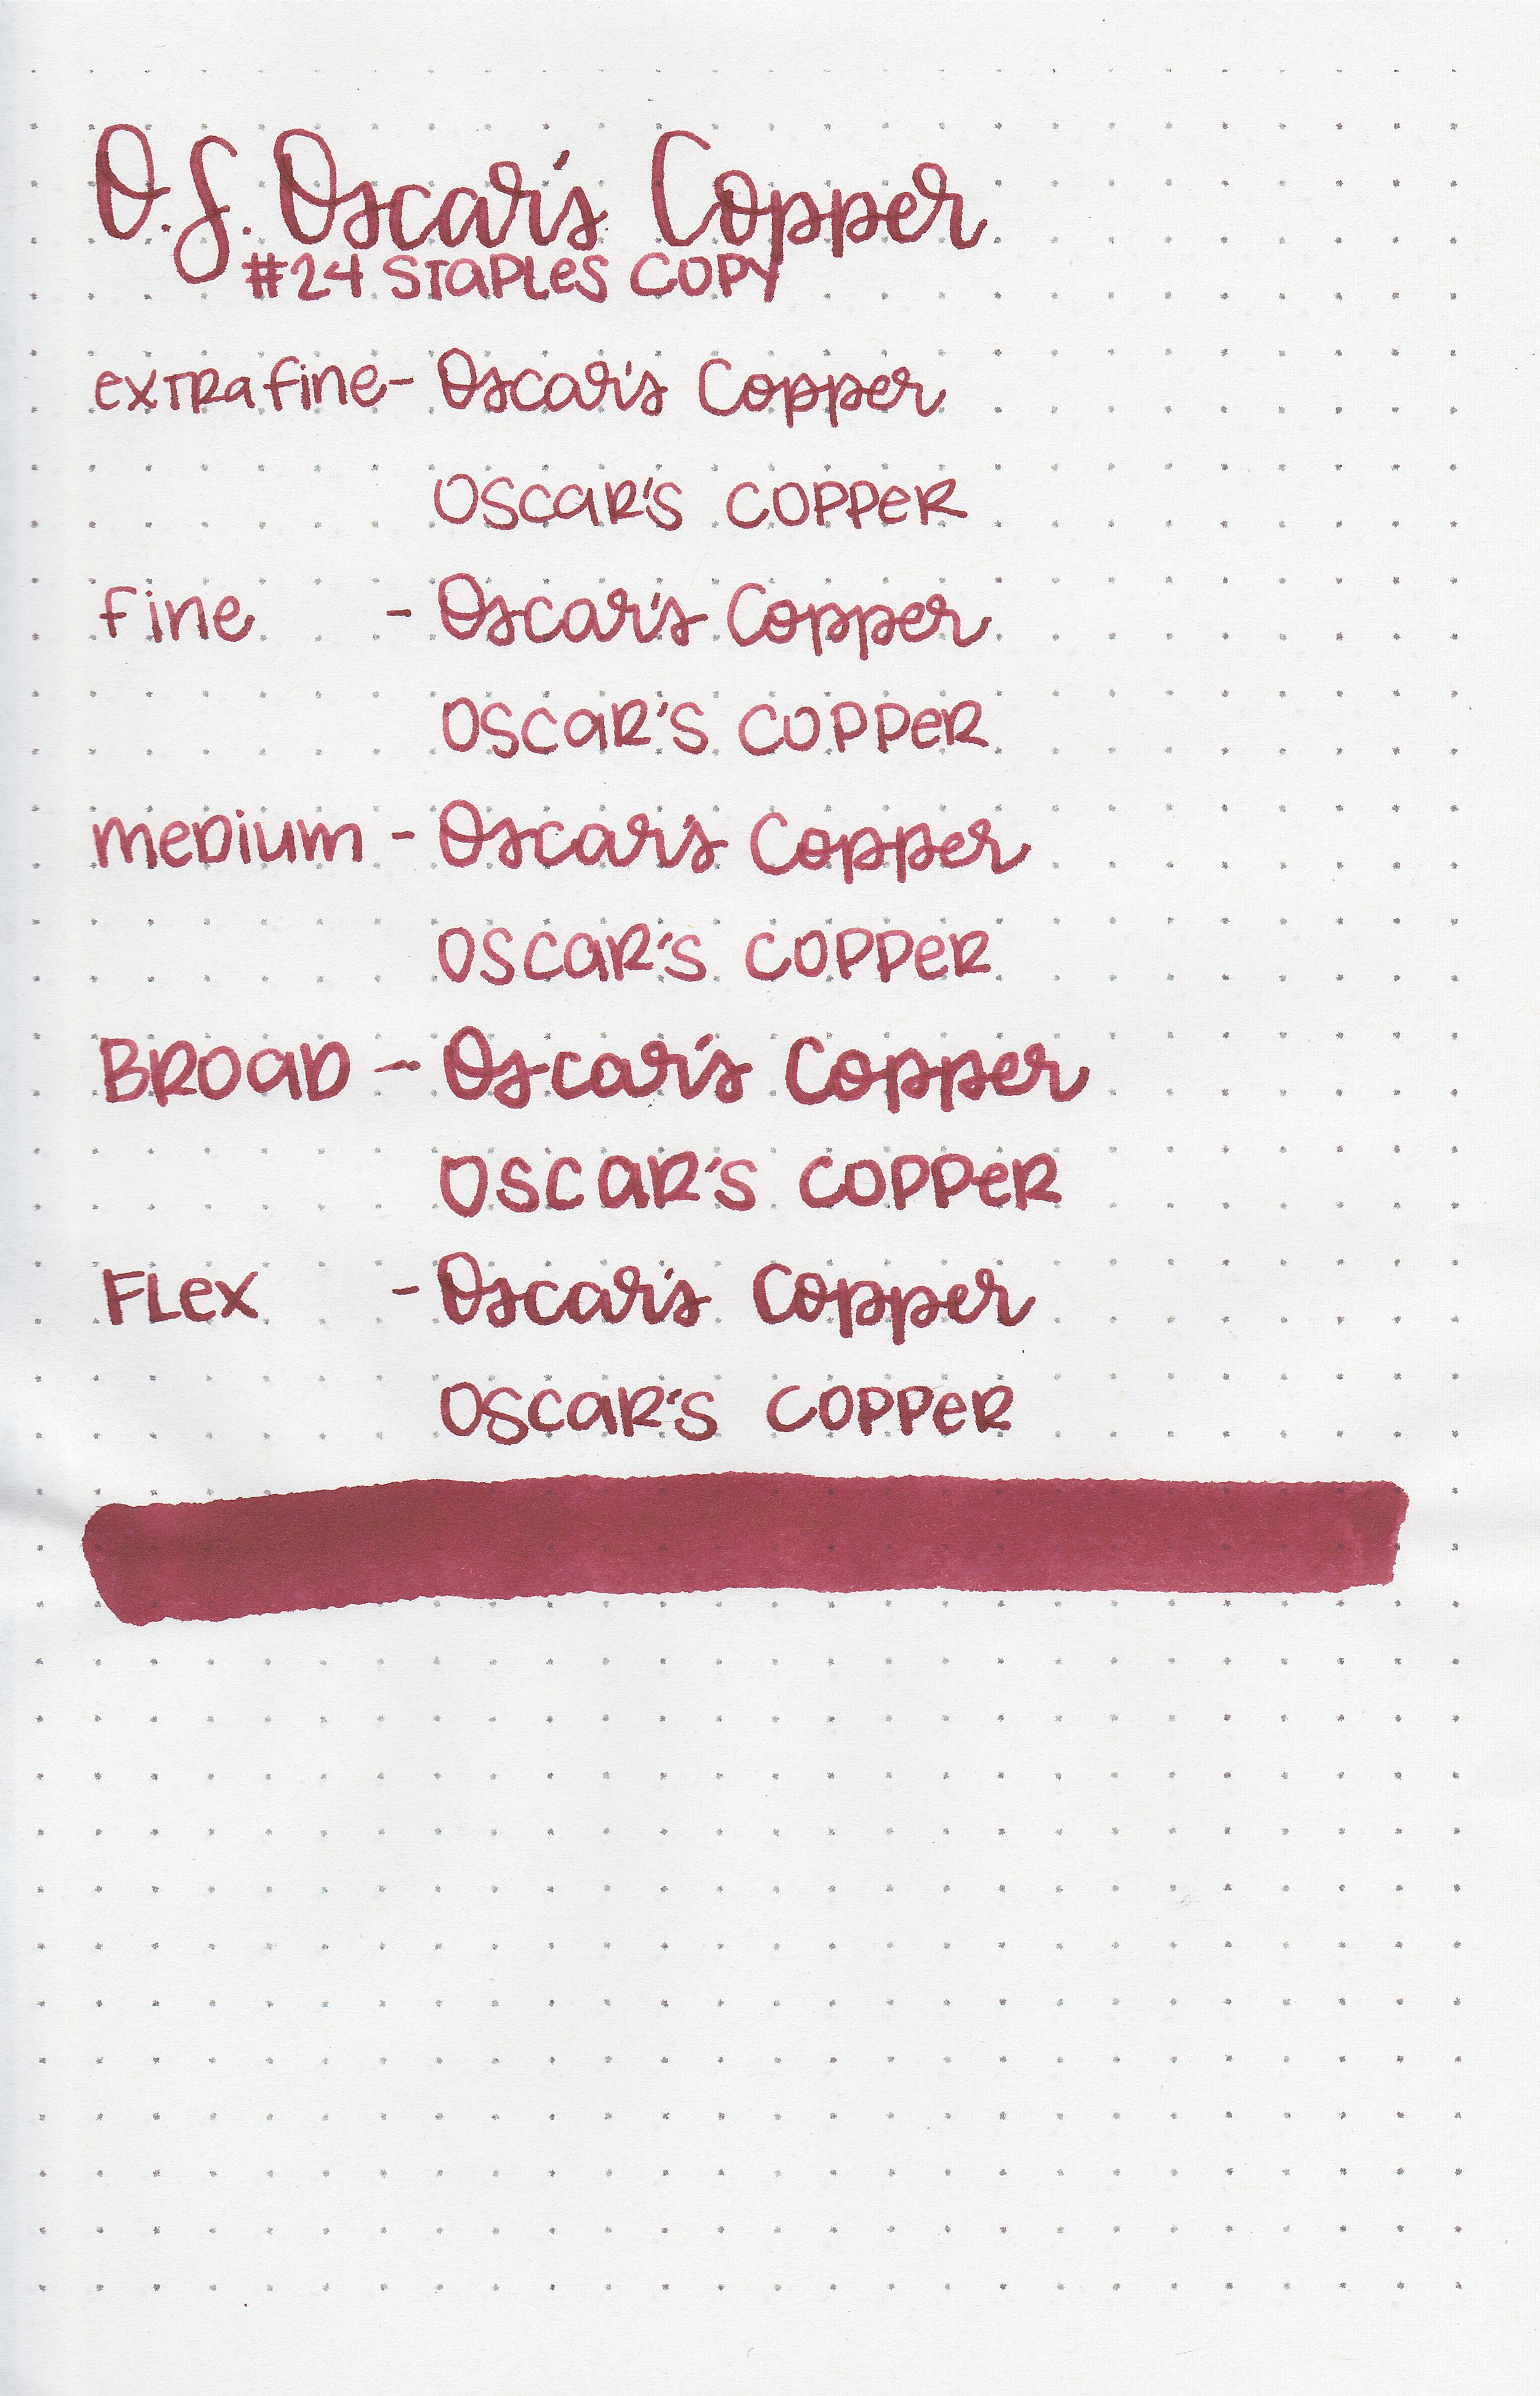 os-oscars-copper-11.jpg